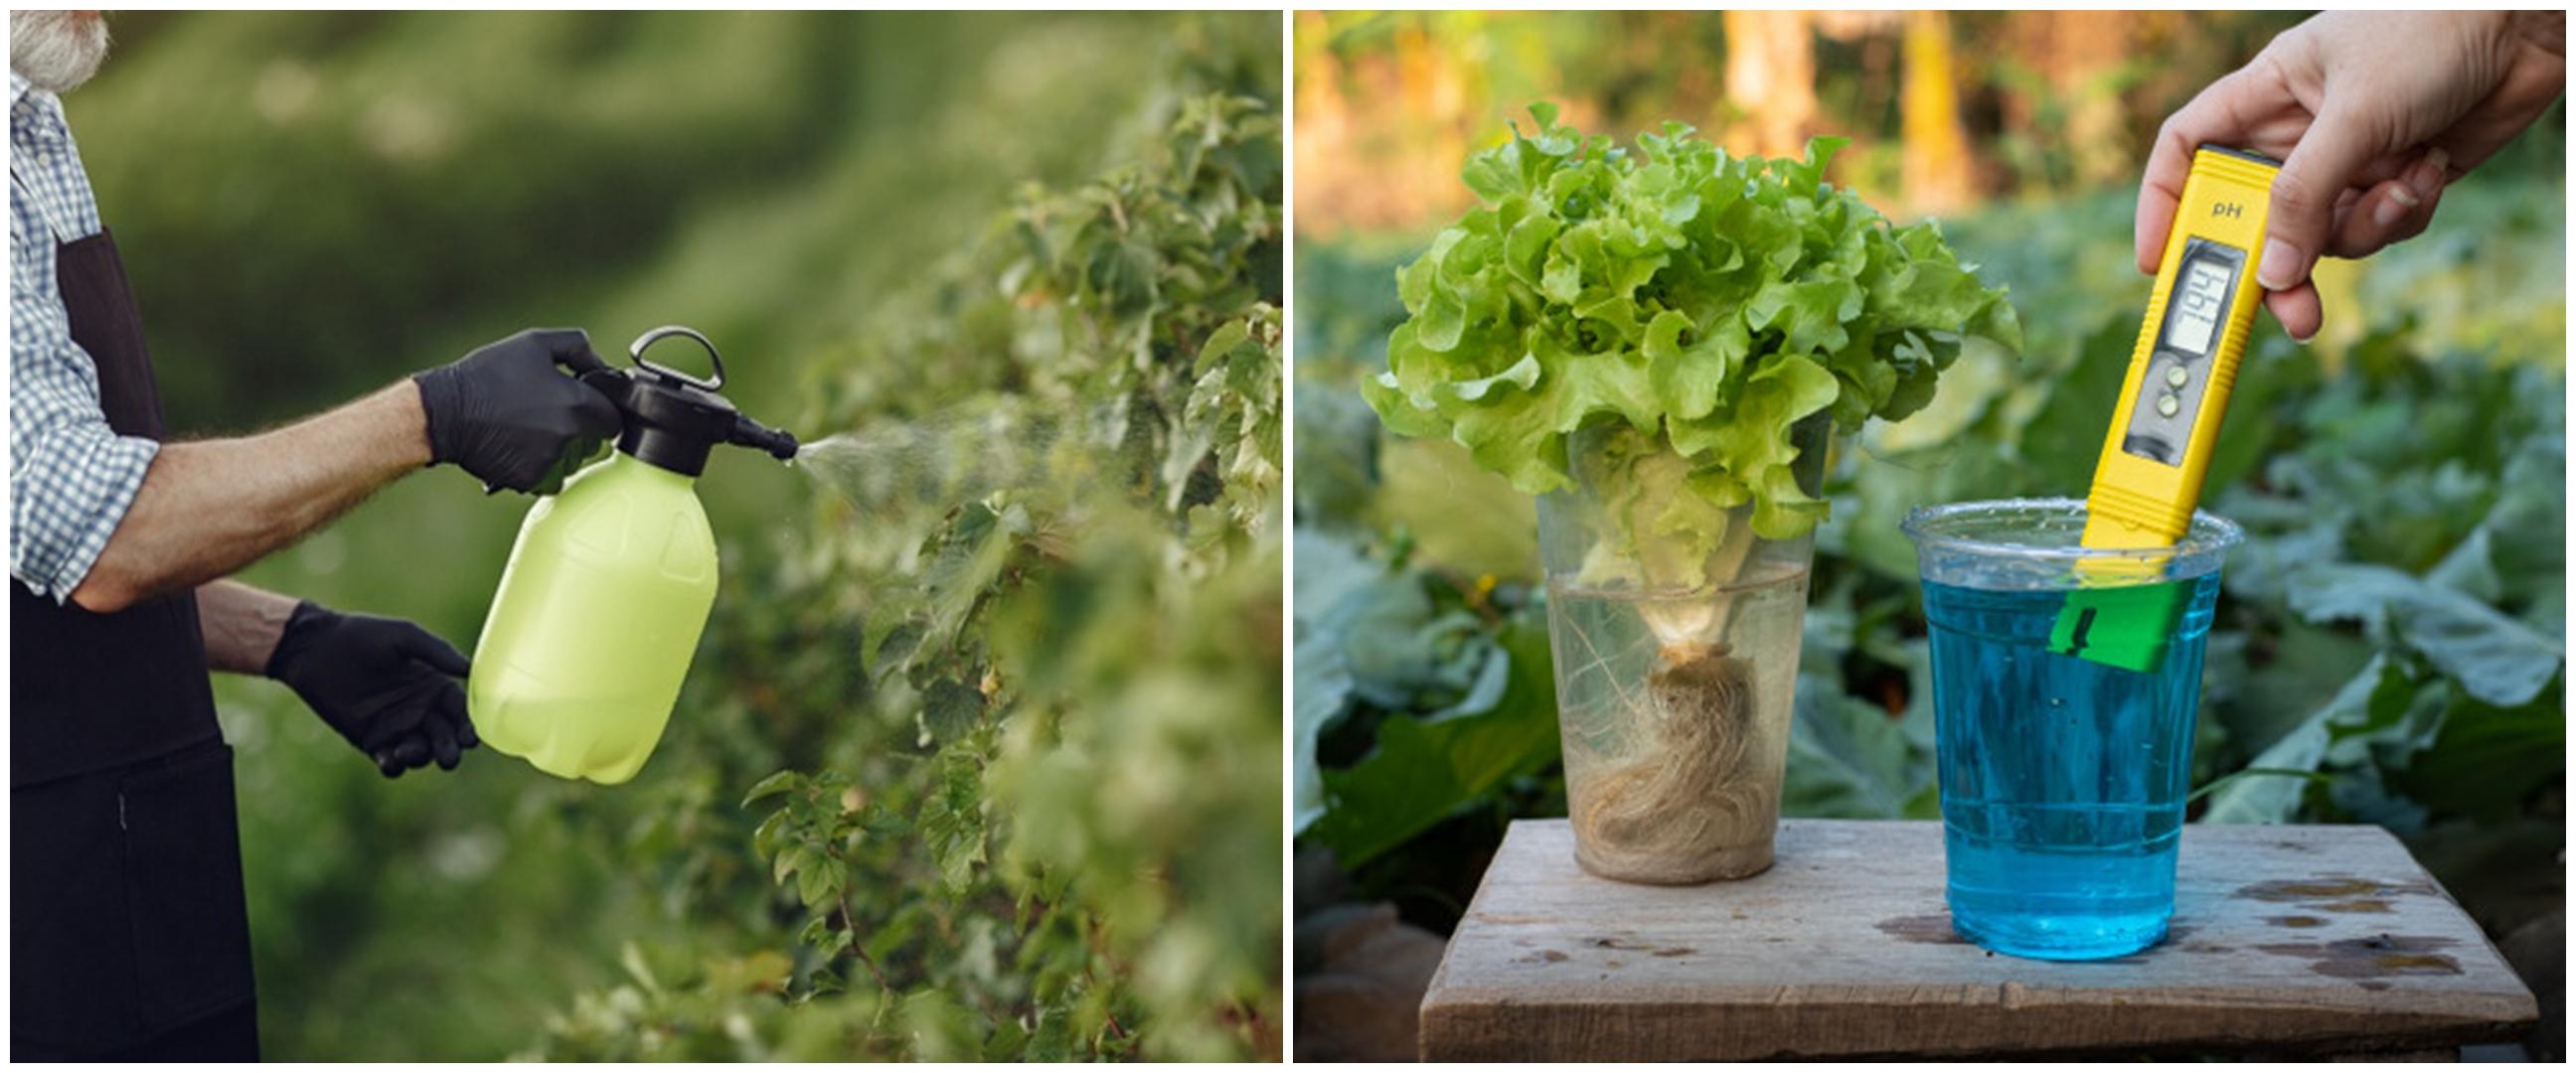 5 Jenis hama yang mengganggu tanaman hidroponik beserta solusinya